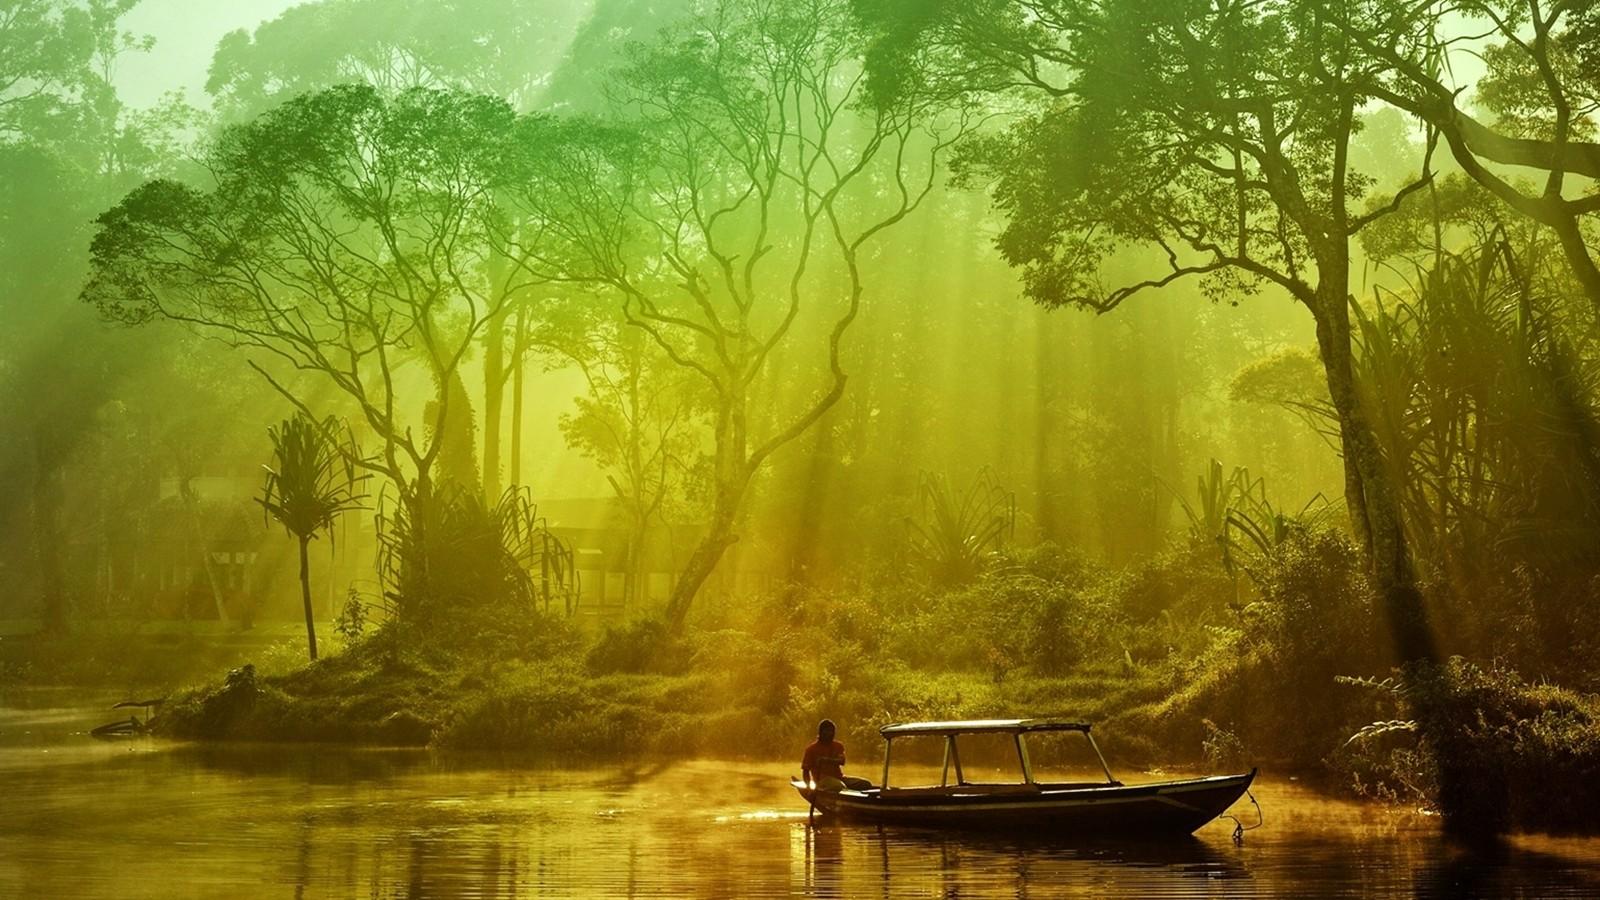 Landscape Wallpaper And Background Image - Amazing Landscape Wallpaper Pc , HD Wallpaper & Backgrounds